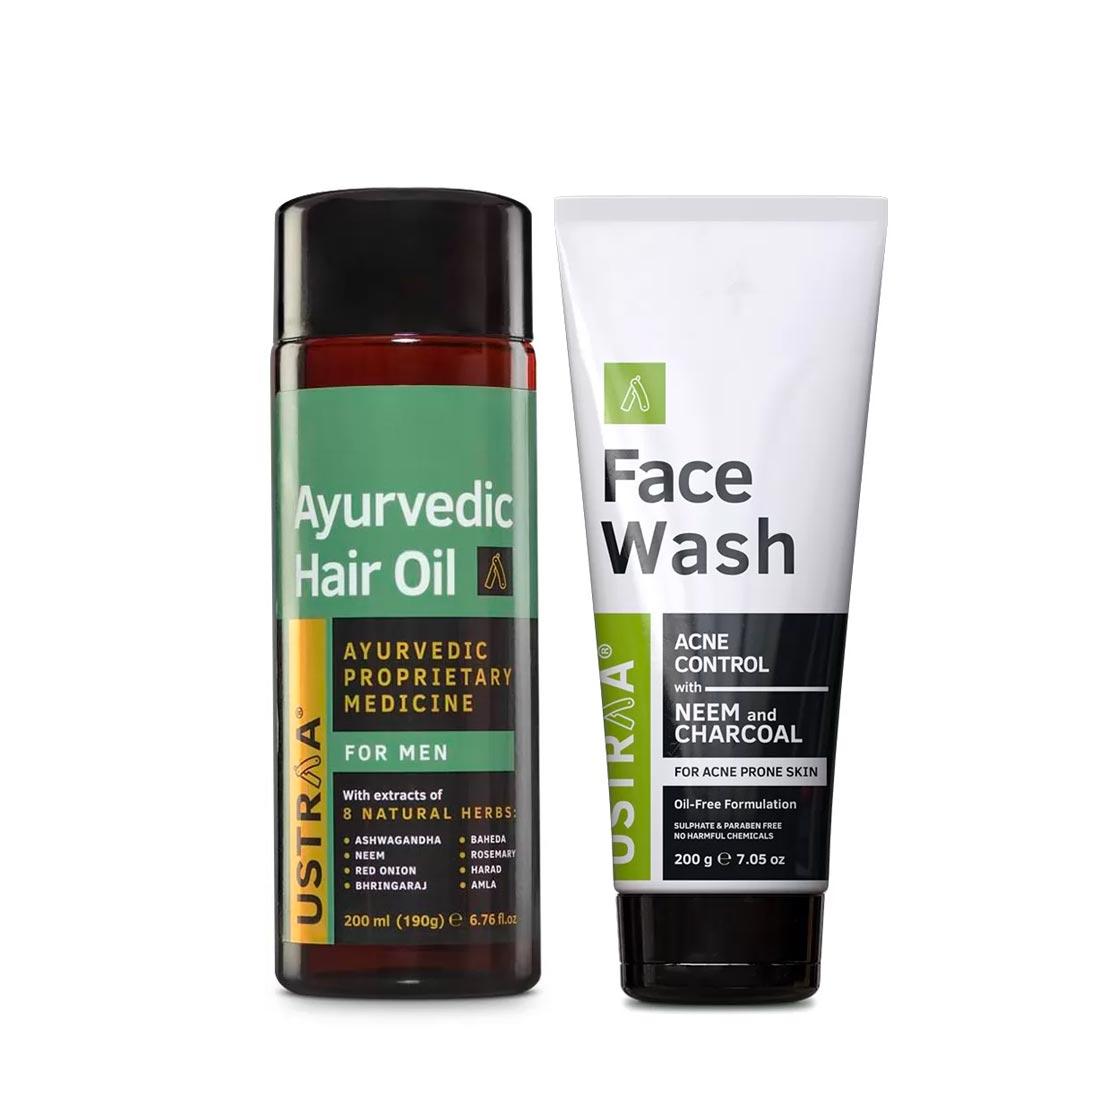 Ustraa | Ustraa Ayurvedic Hair Oil 200 ml and Face Wash (Neem & Charcoal) 200g